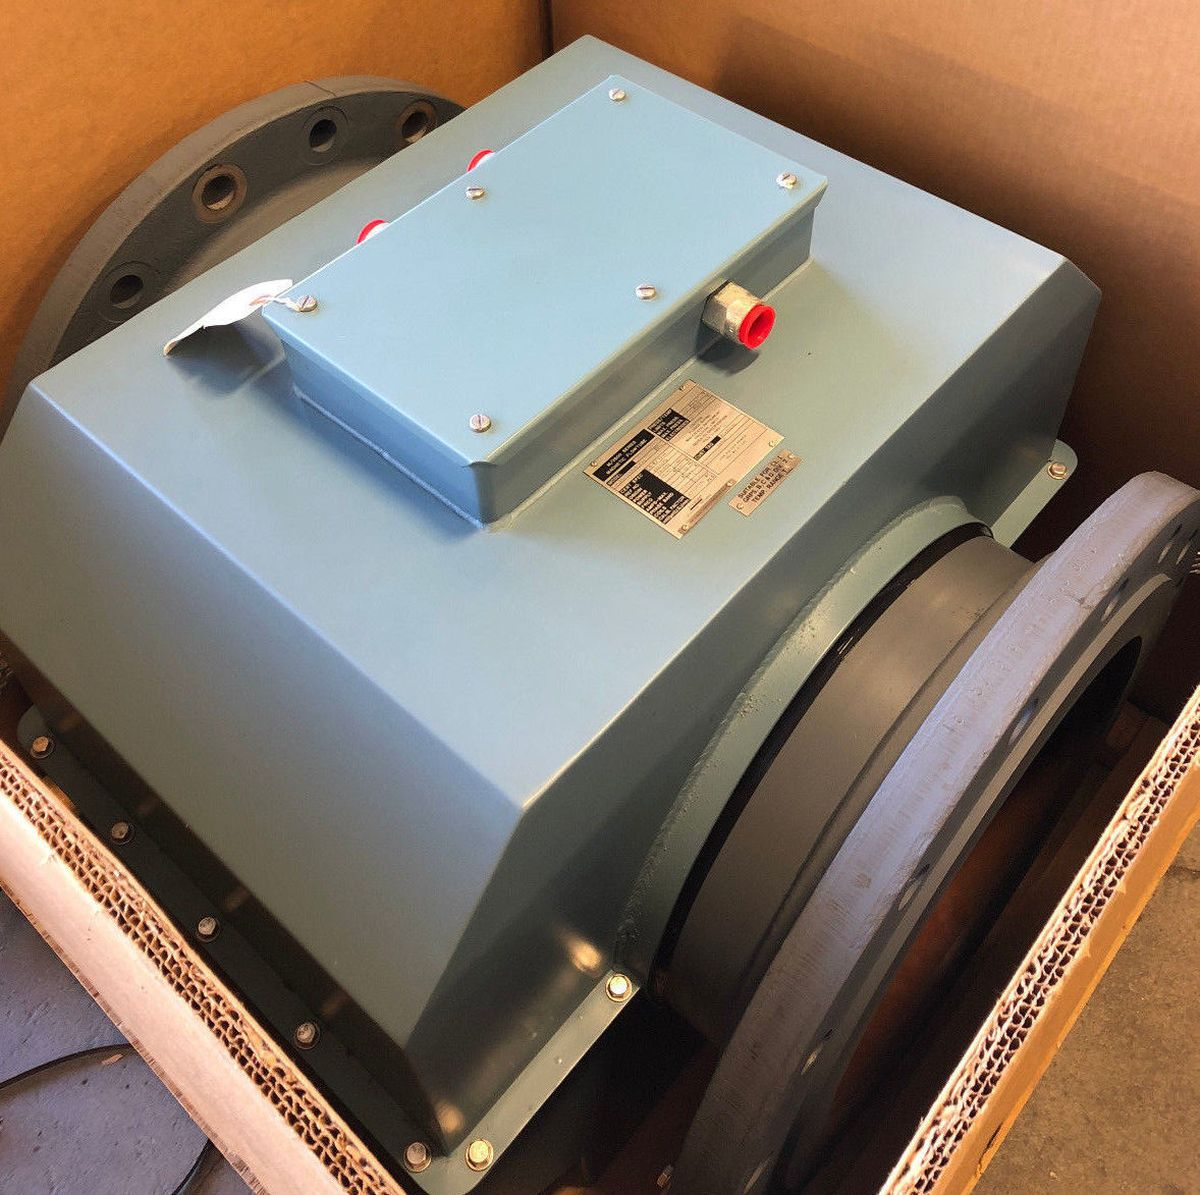 Foxboro 2816-SEBA-ASA-G 16in. CL150 Magnetic Flowmeter